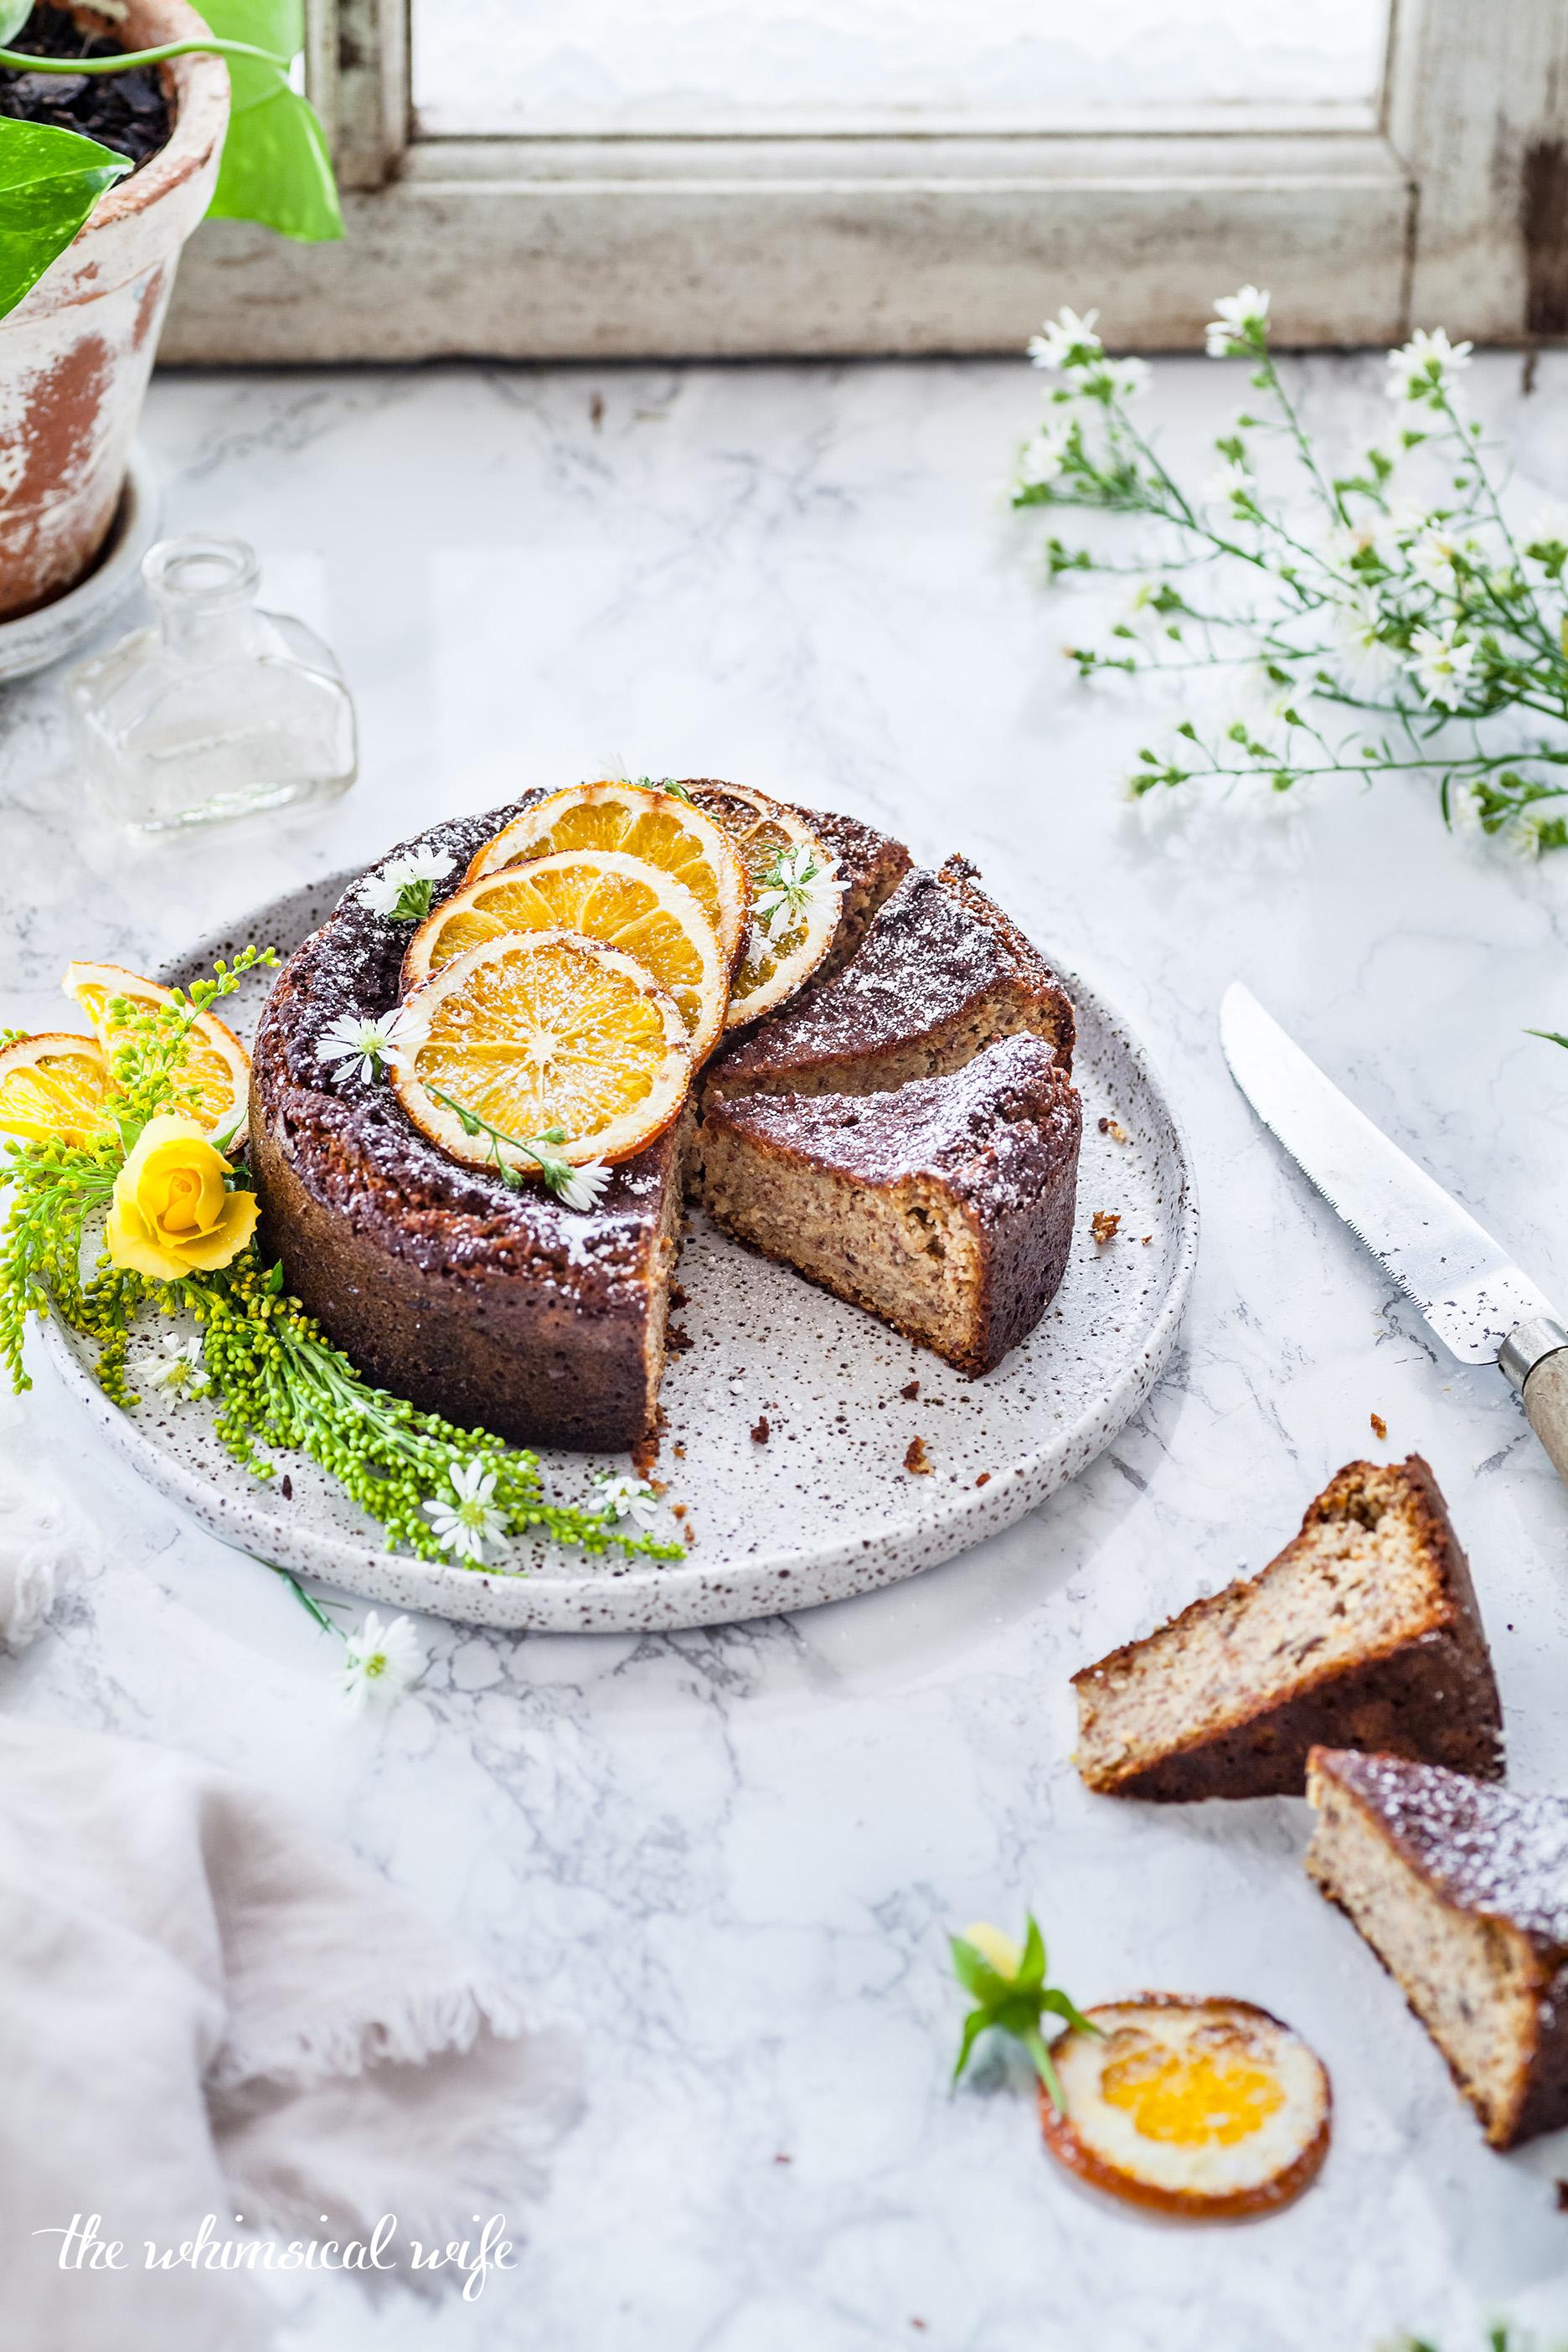 30 Cakes In 30 Days | 5. Orange & Almond Cake {Vegan, Gluten & Dairy Free} | The Whimsical Wife